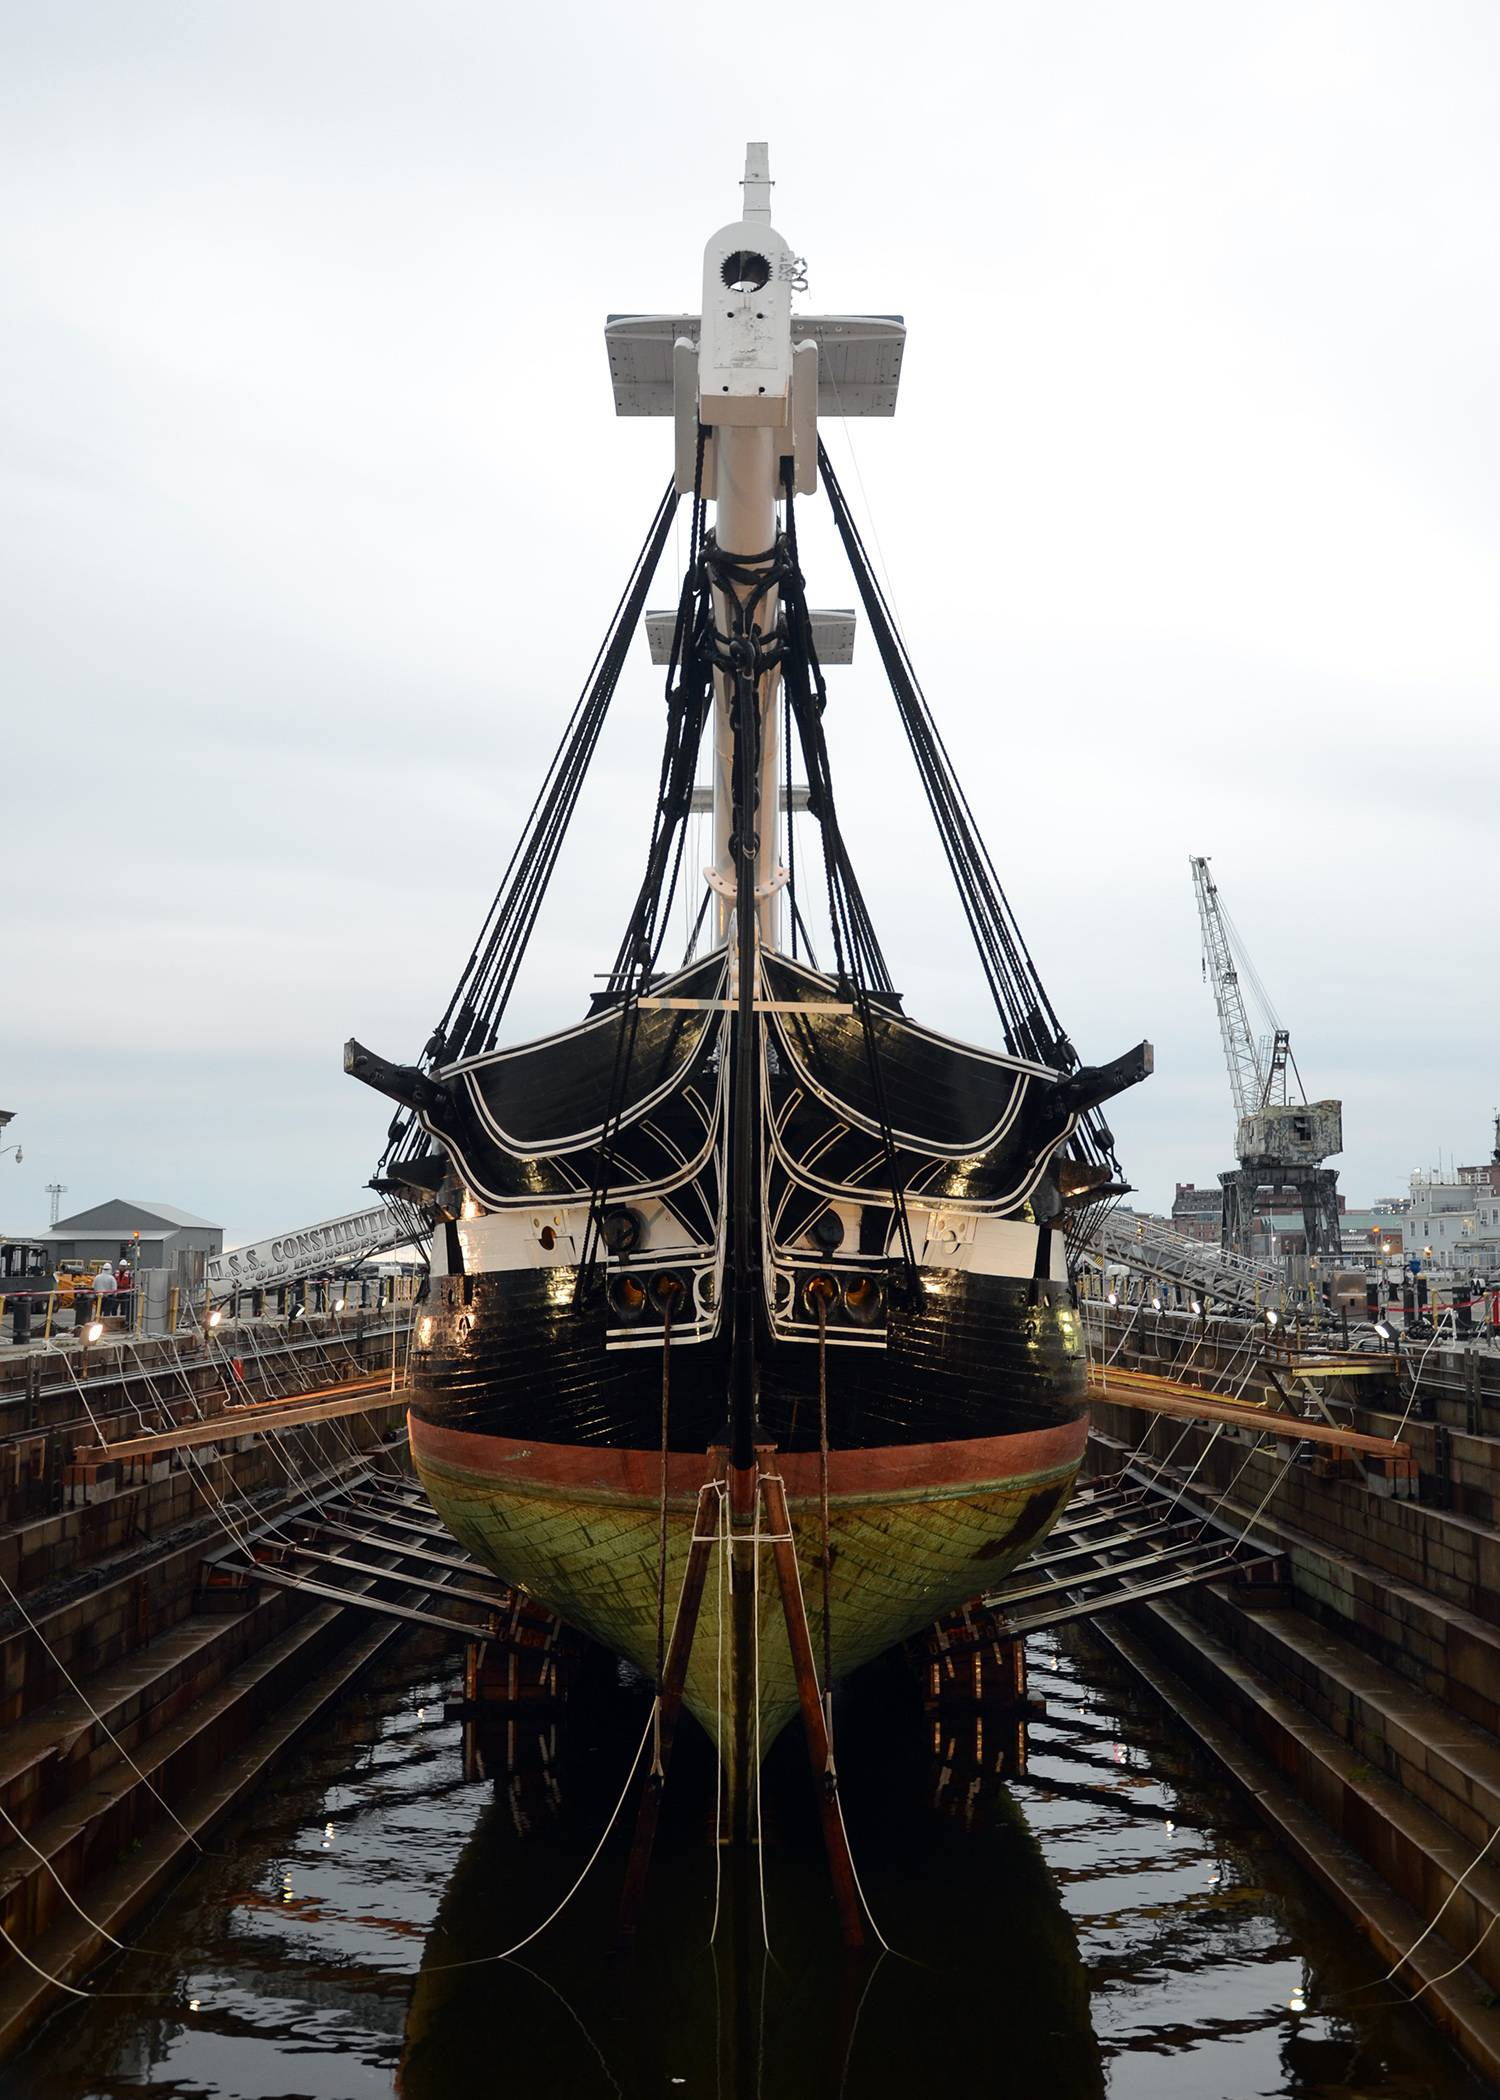 Historic Warship Docked For Restoration